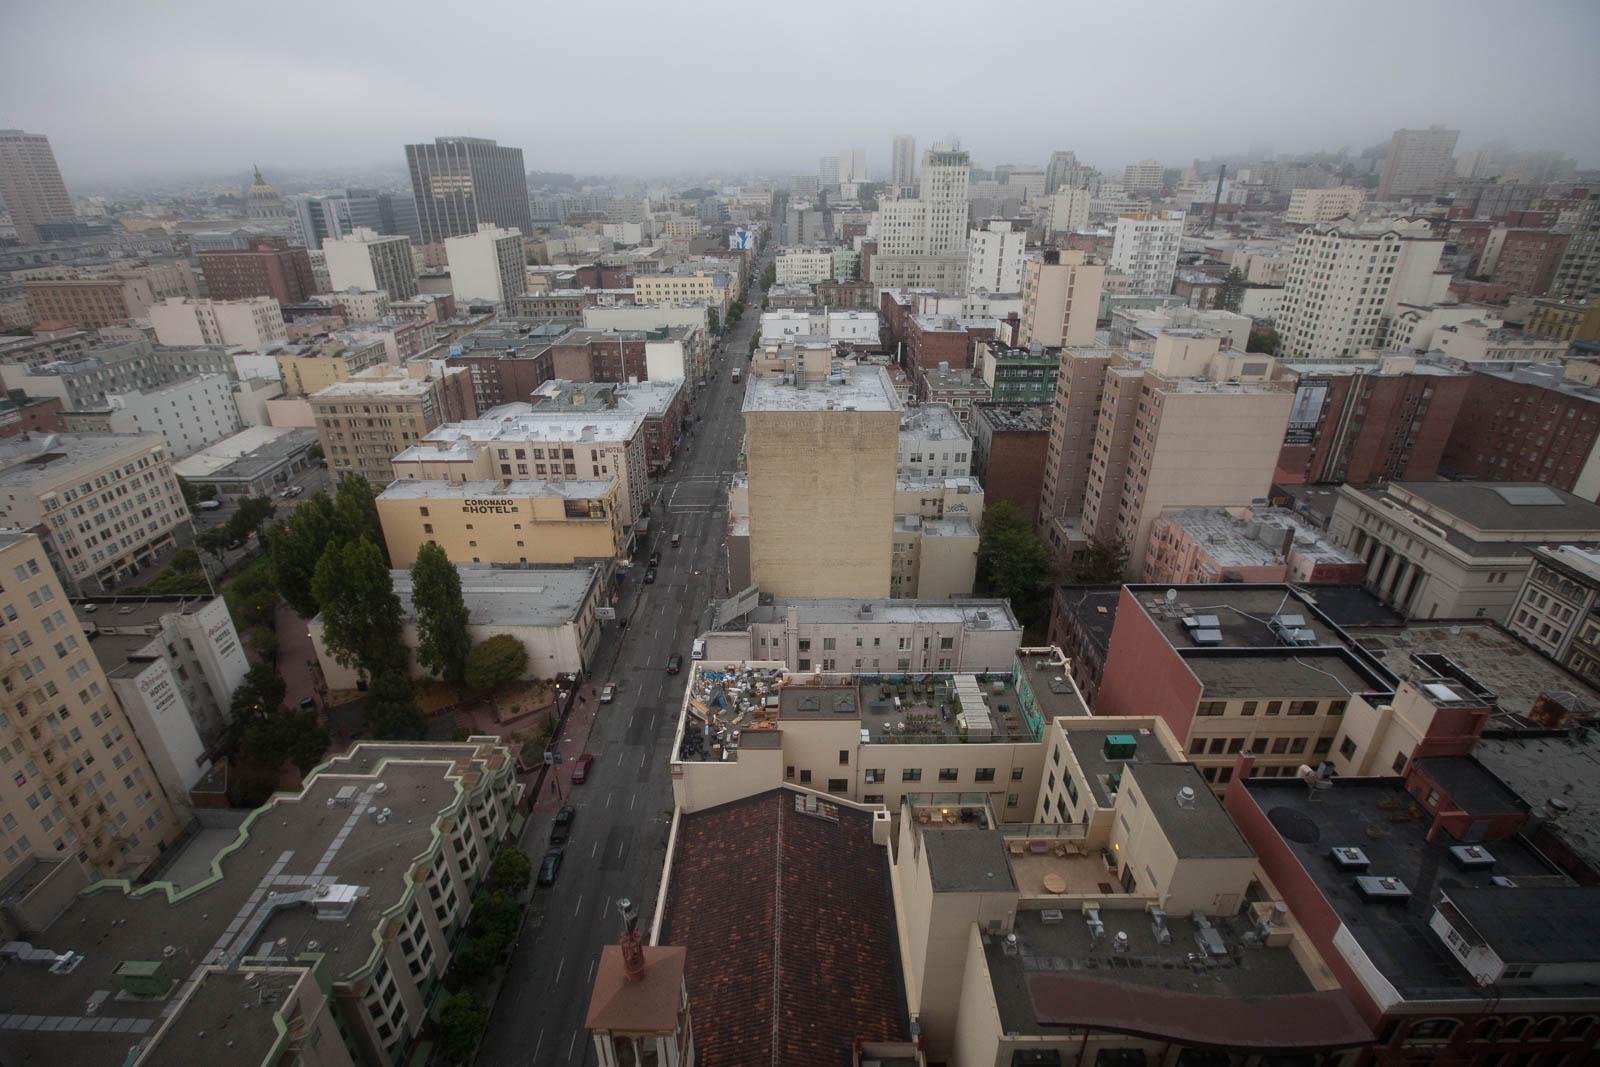 Room 2483, Hilton San Francisco, USA